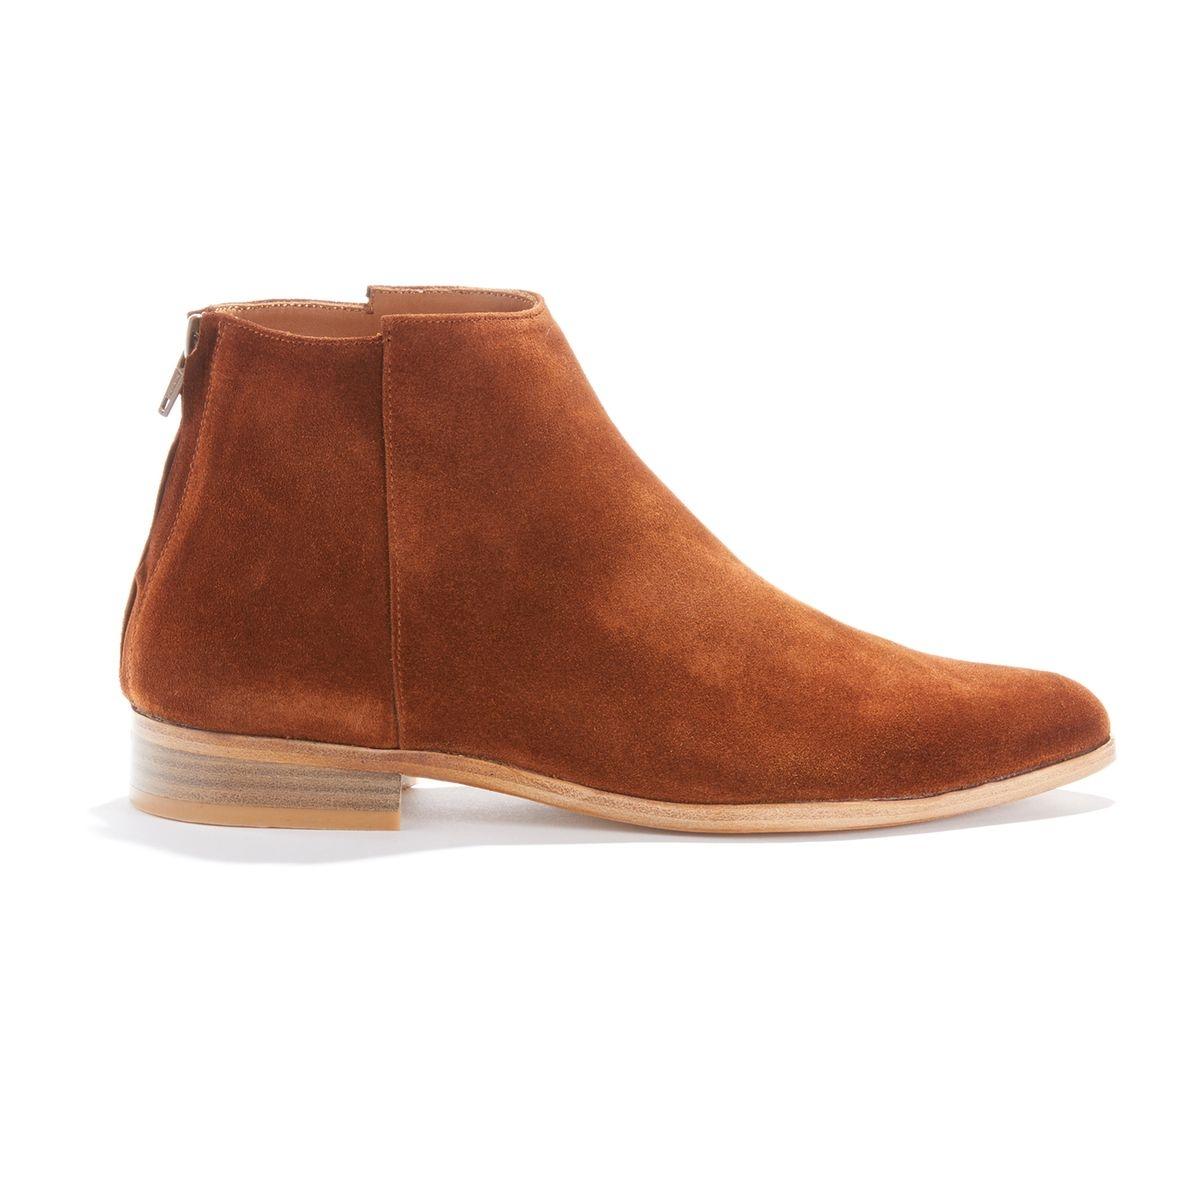 Boots cuir vachette TERRANCE DAIM